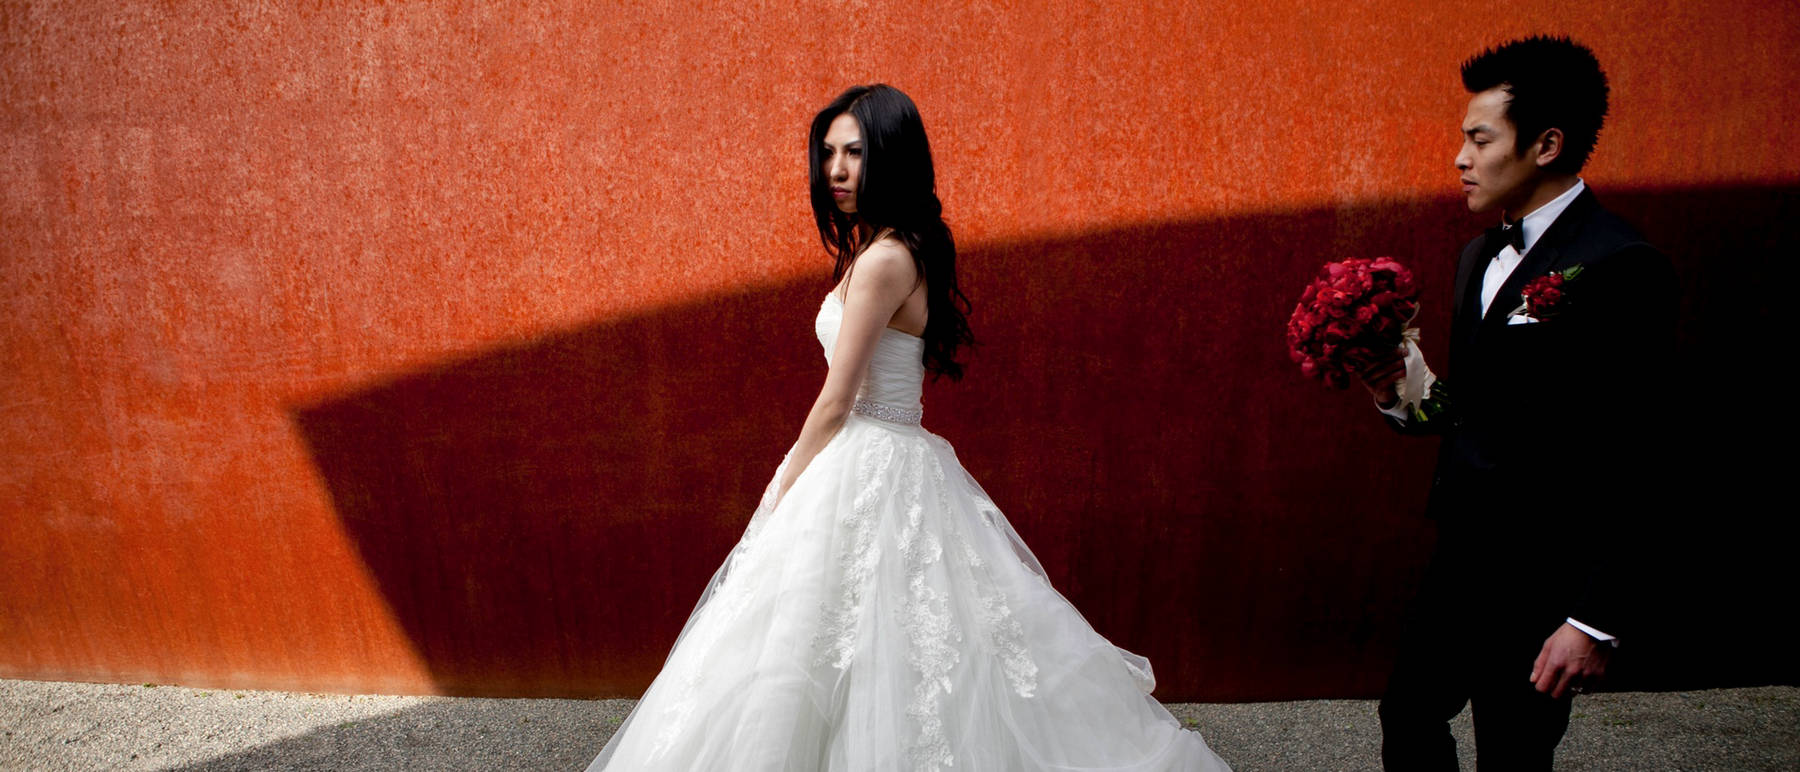 johnandjoseph-wedding-photographer-hz-slider-289